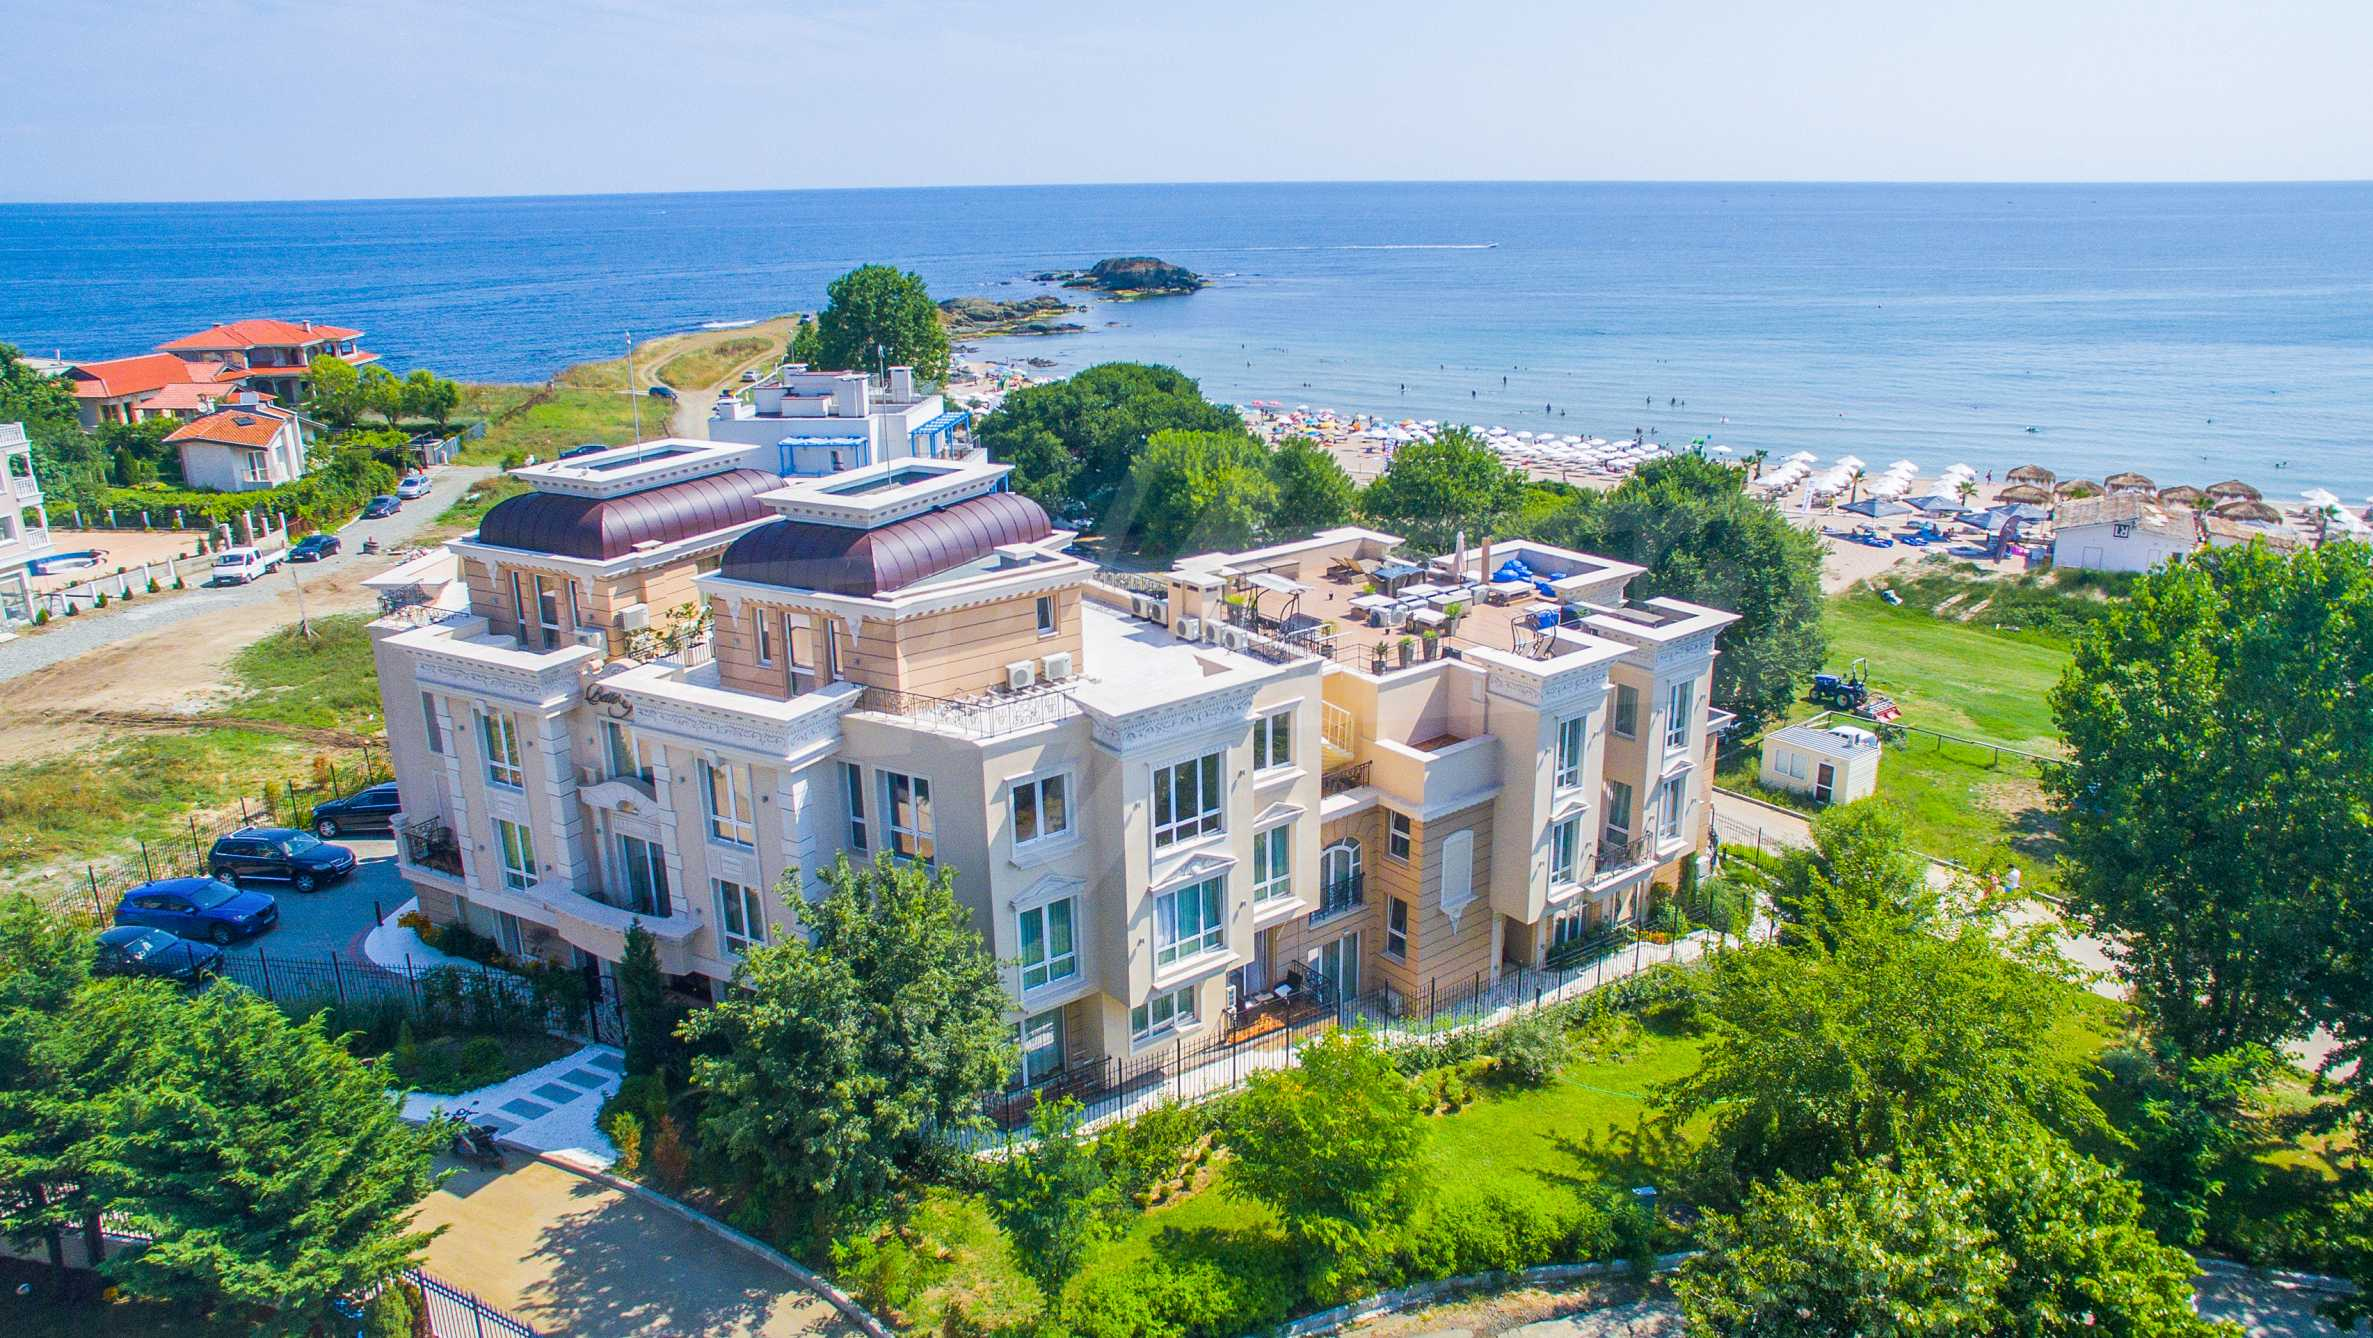 Exclusive 2-bedroom beachfront apartment in the prestigious Belle Époque Beach Residence 48